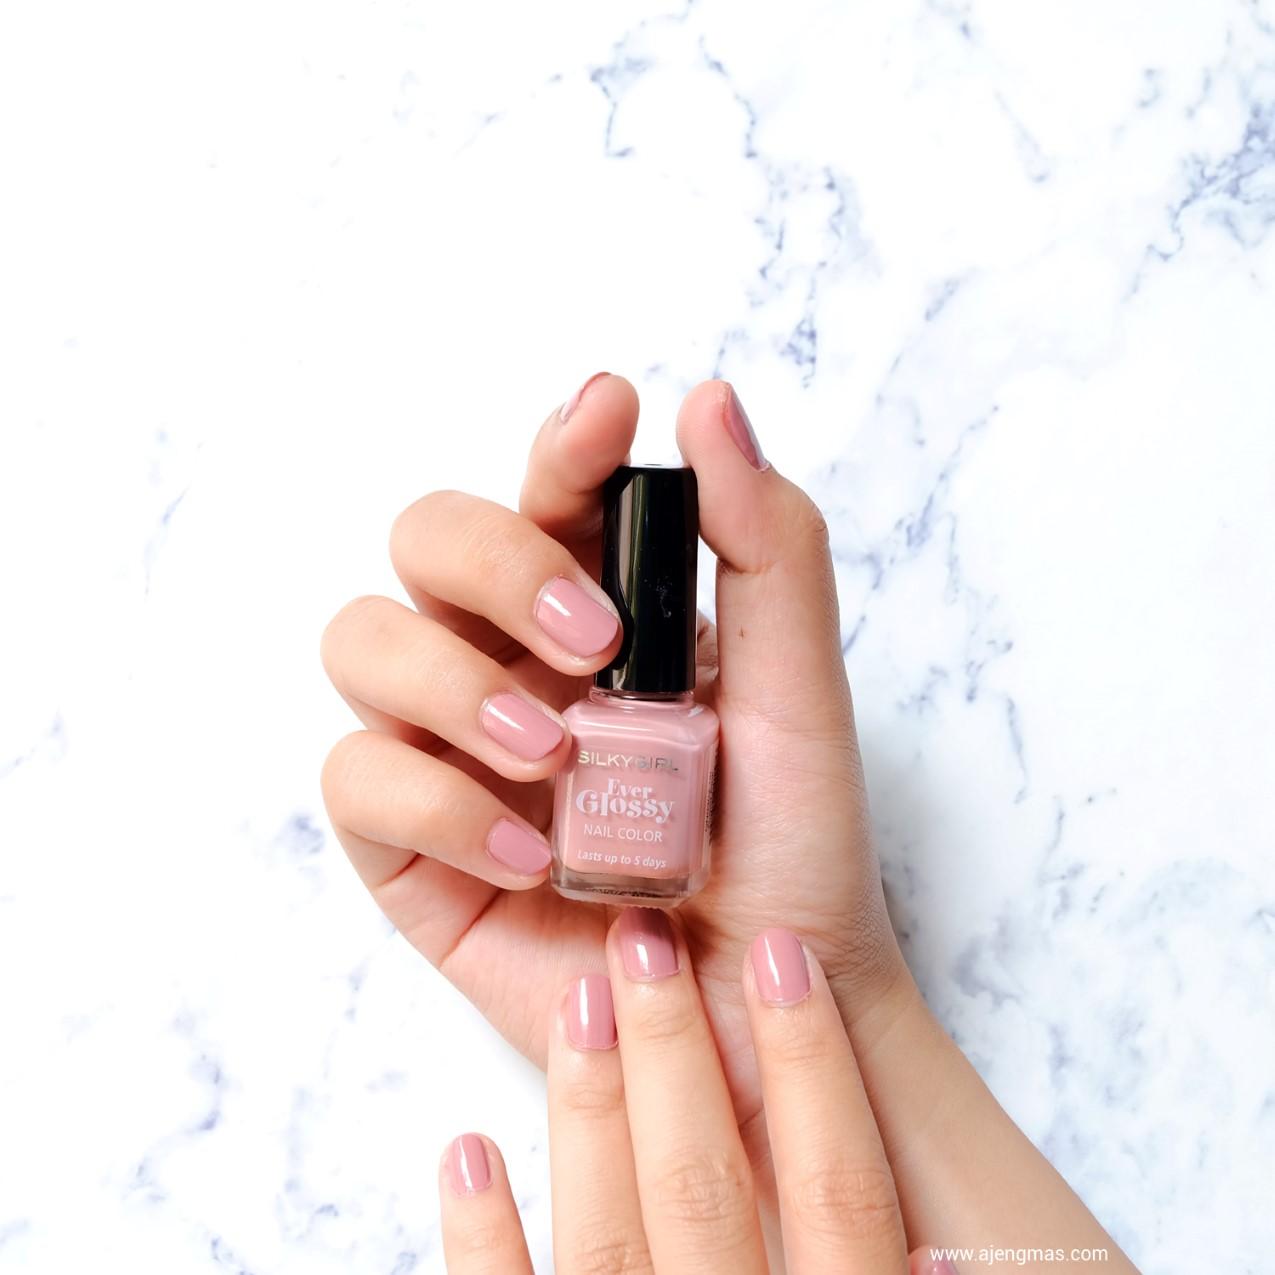 kutek-murah-silky-girl-ever-glossy-nail-color-pink-nude-ajengmas